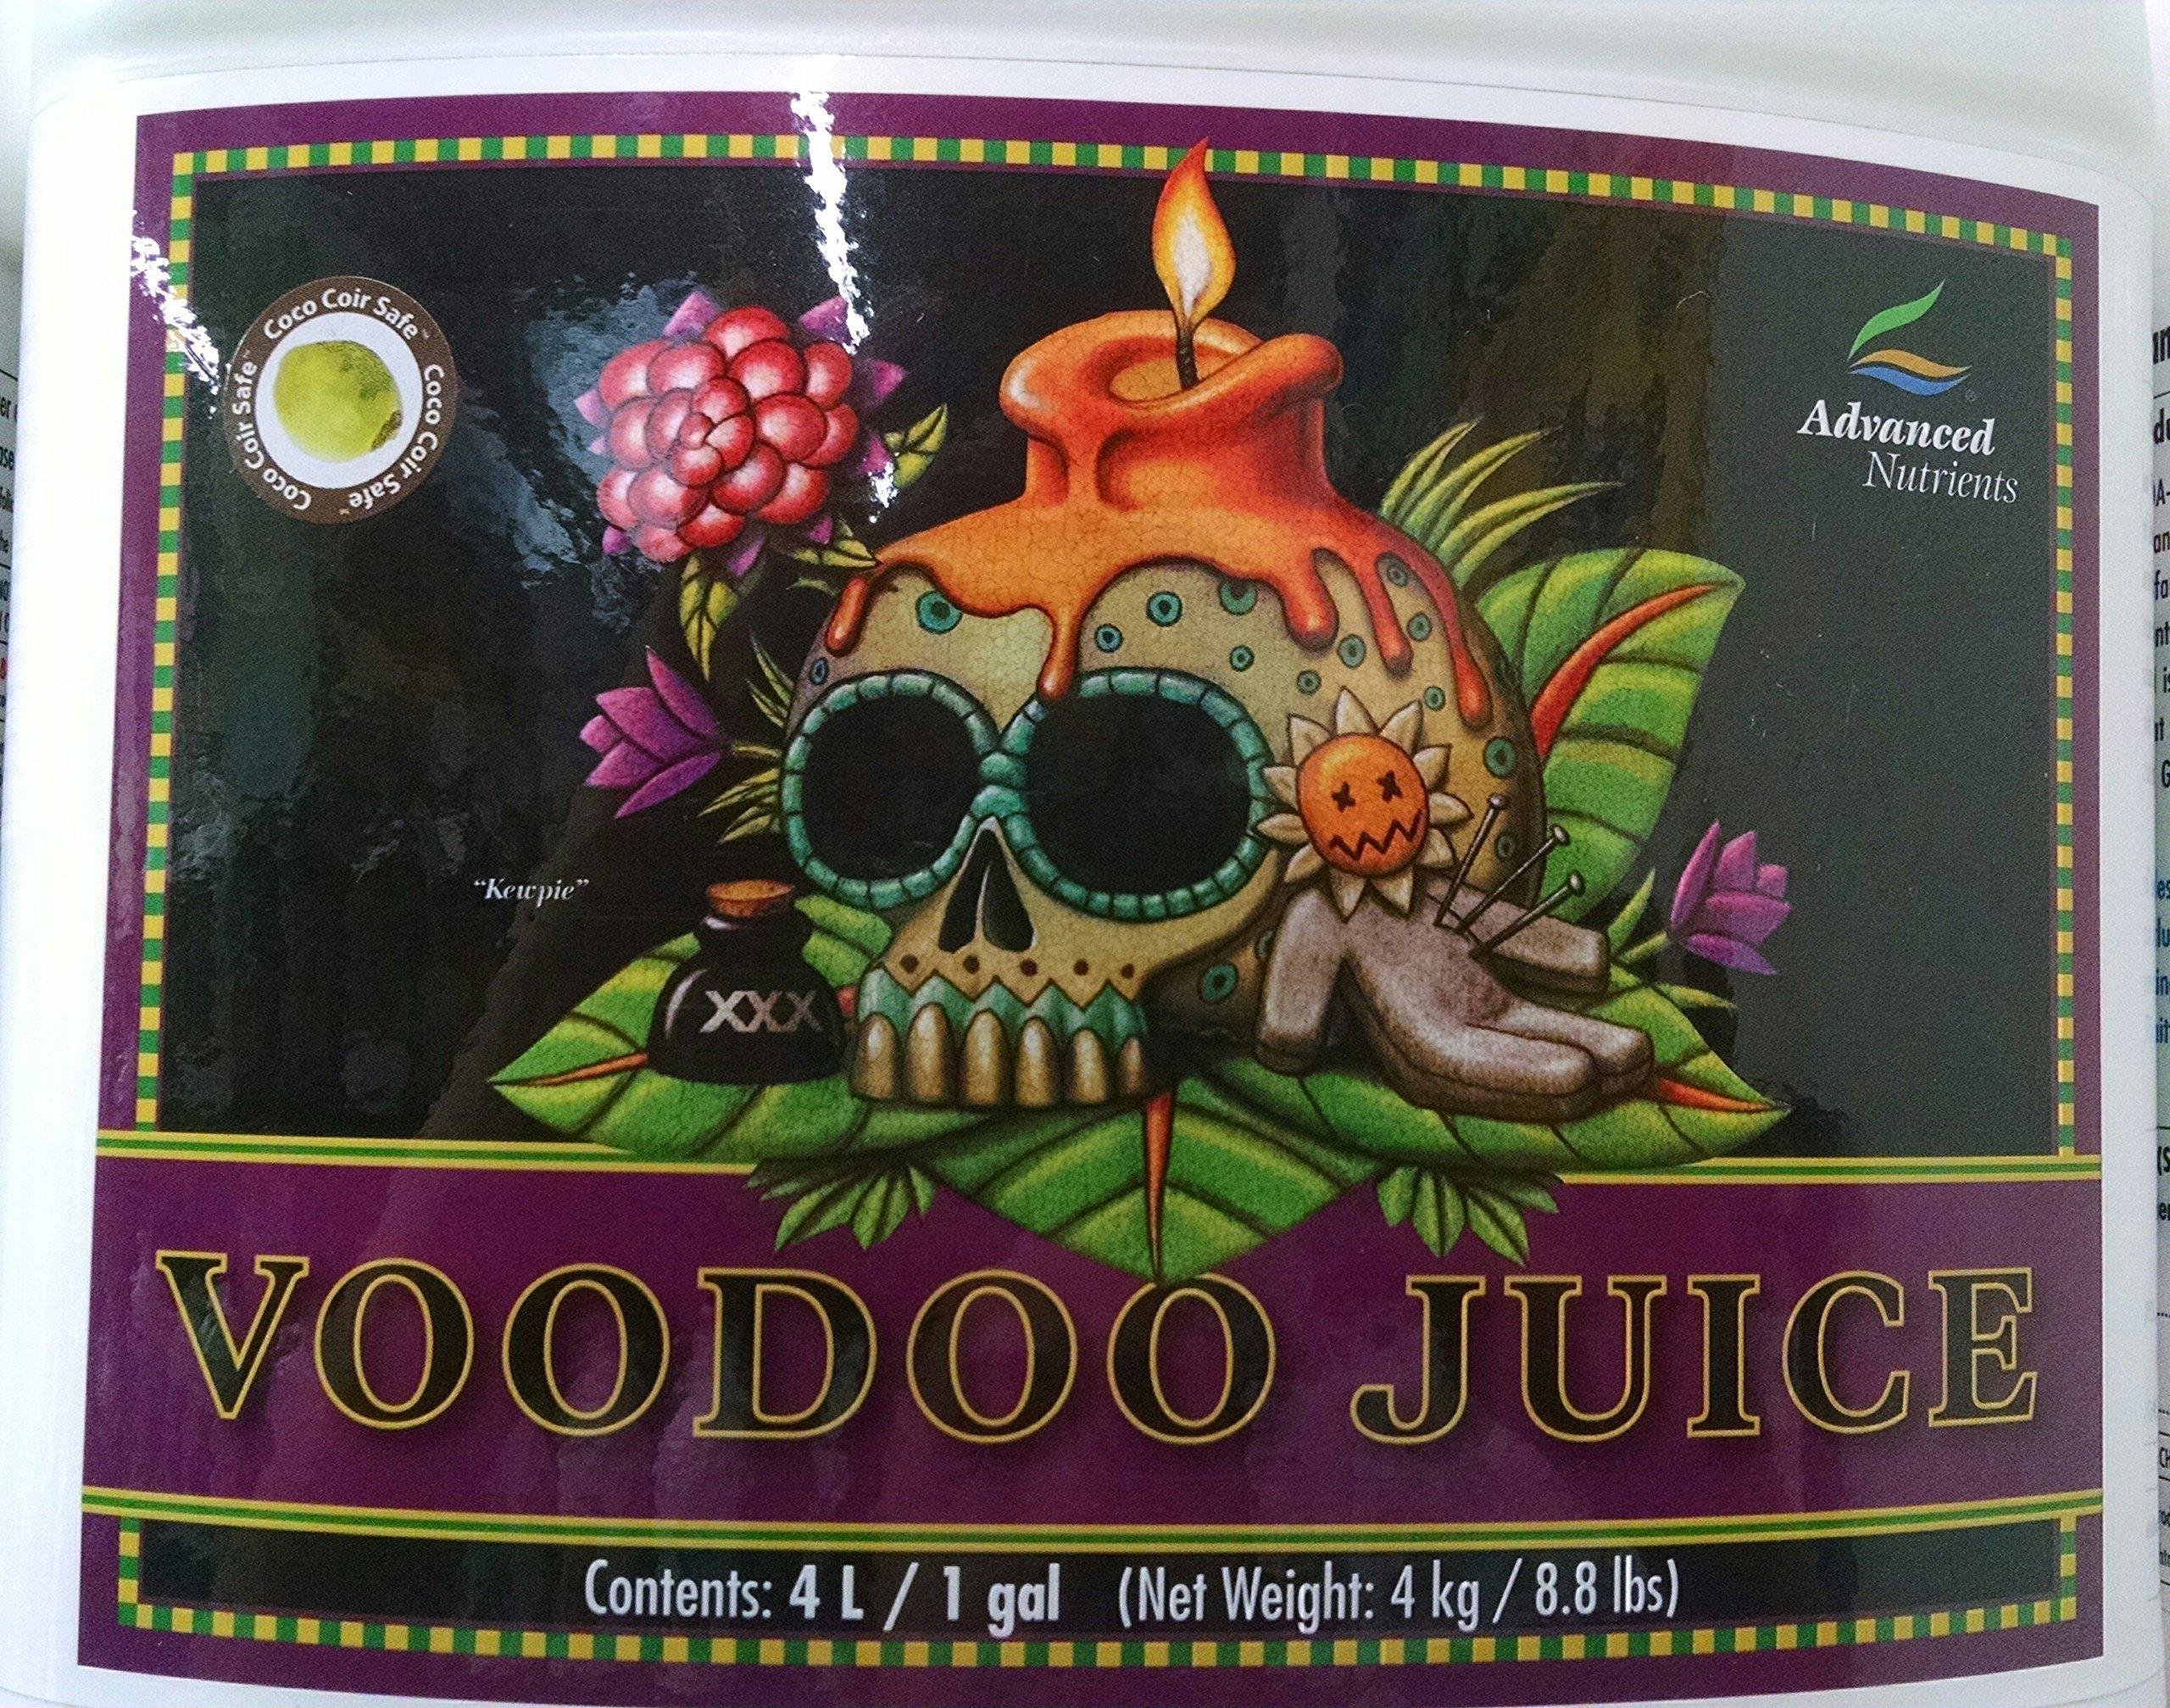 Advanced Nutrients Voodoo Juice Fertilizer, 4L by Advanced Nutrients